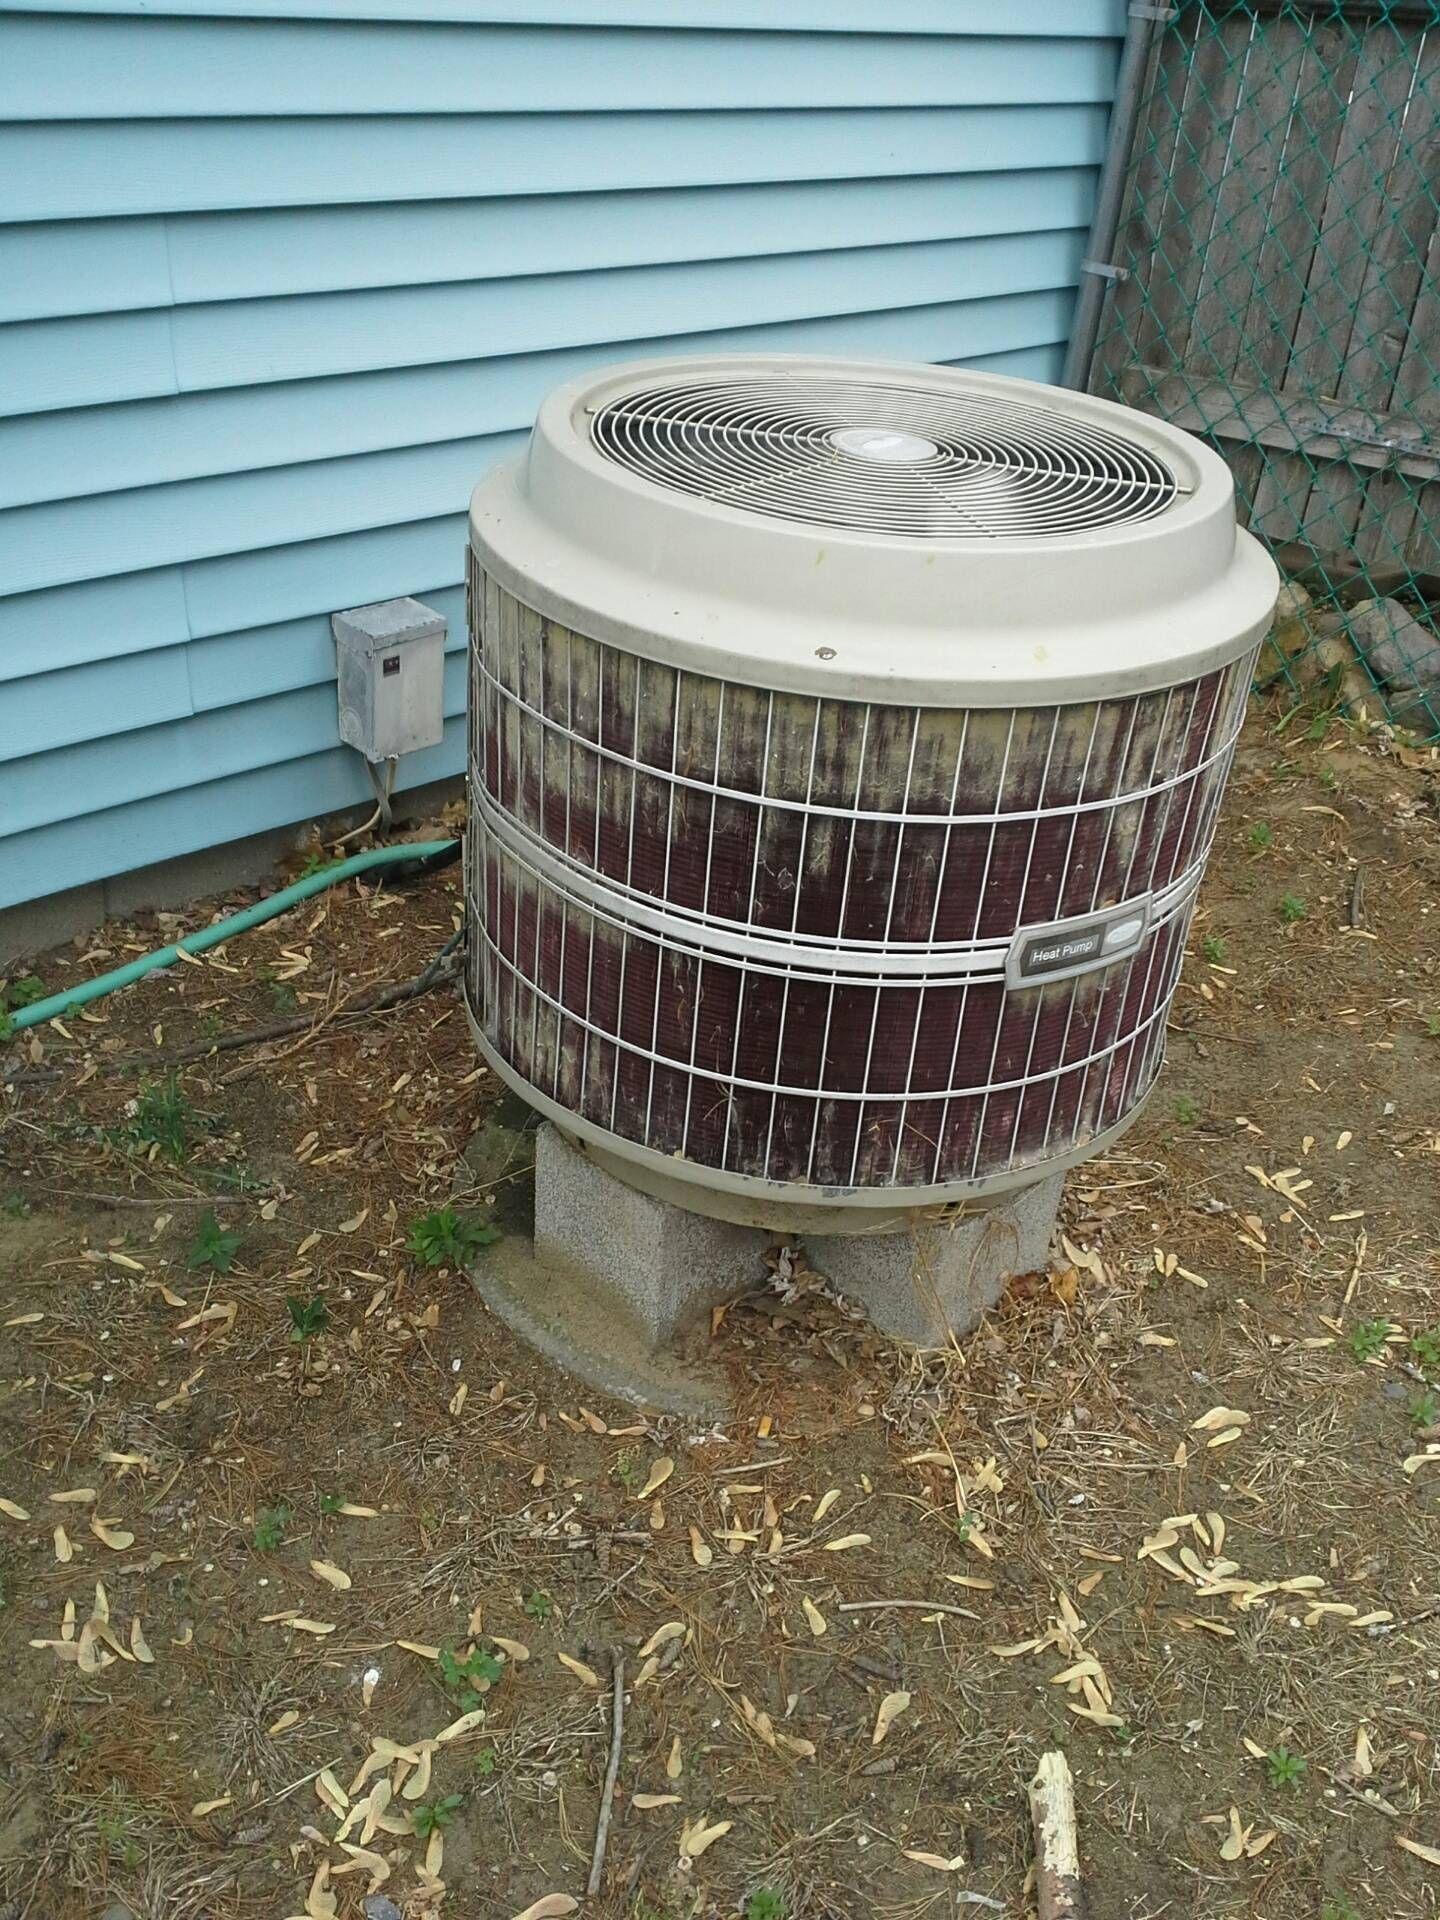 Image Result For Old Ruud Heat Pump Condenser Outdoor Ottoman Outdoor Outdoor Decor